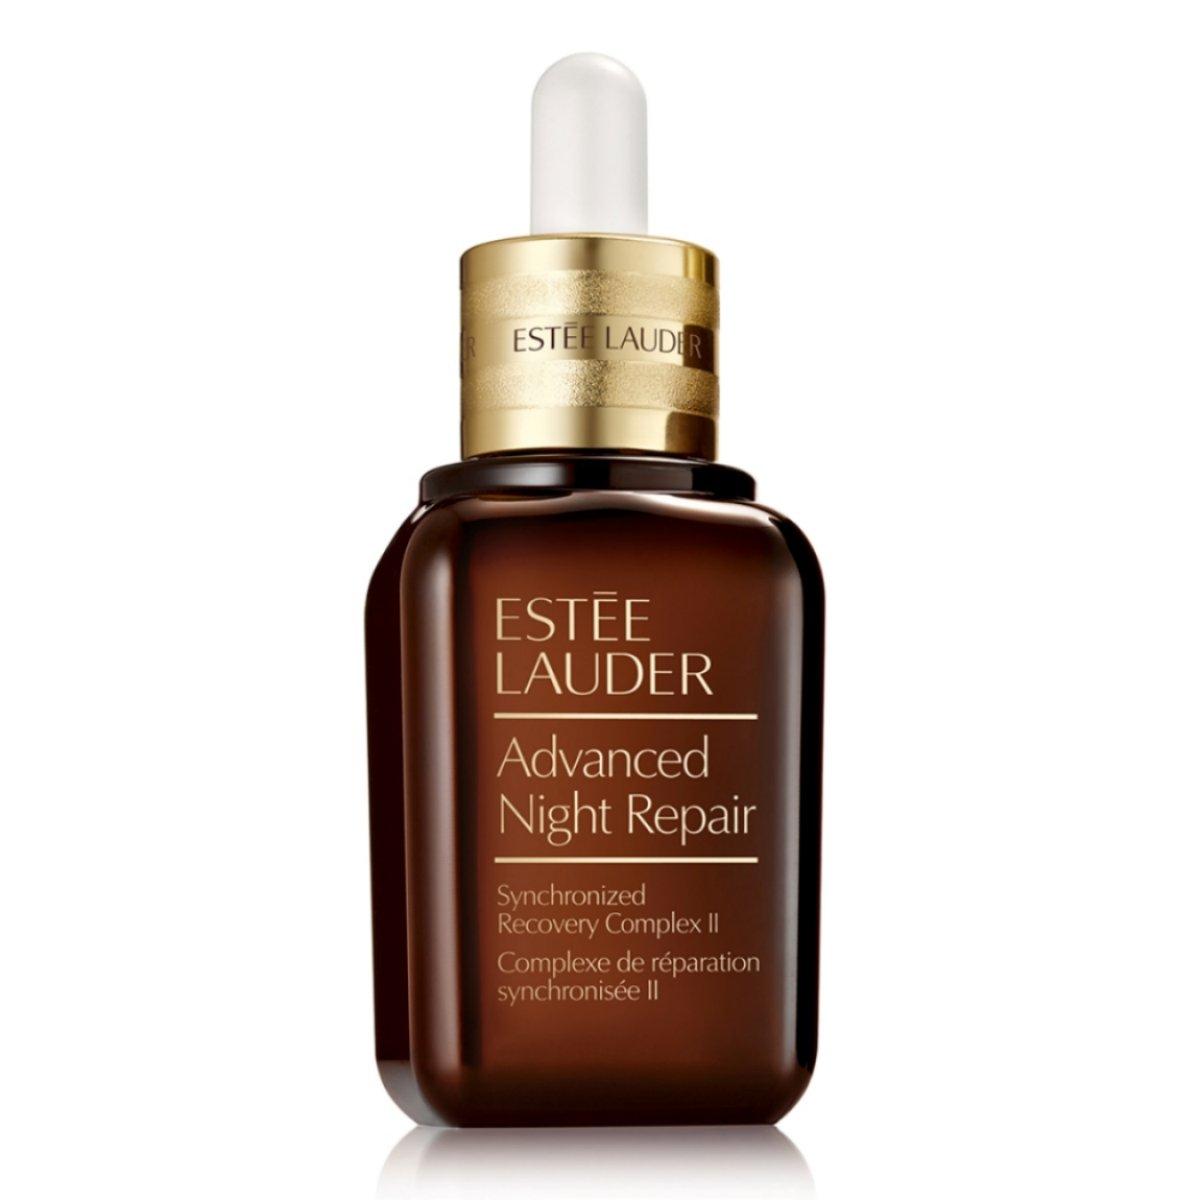 Estee Lauder Advanced Night Repair Synchronized Recovery